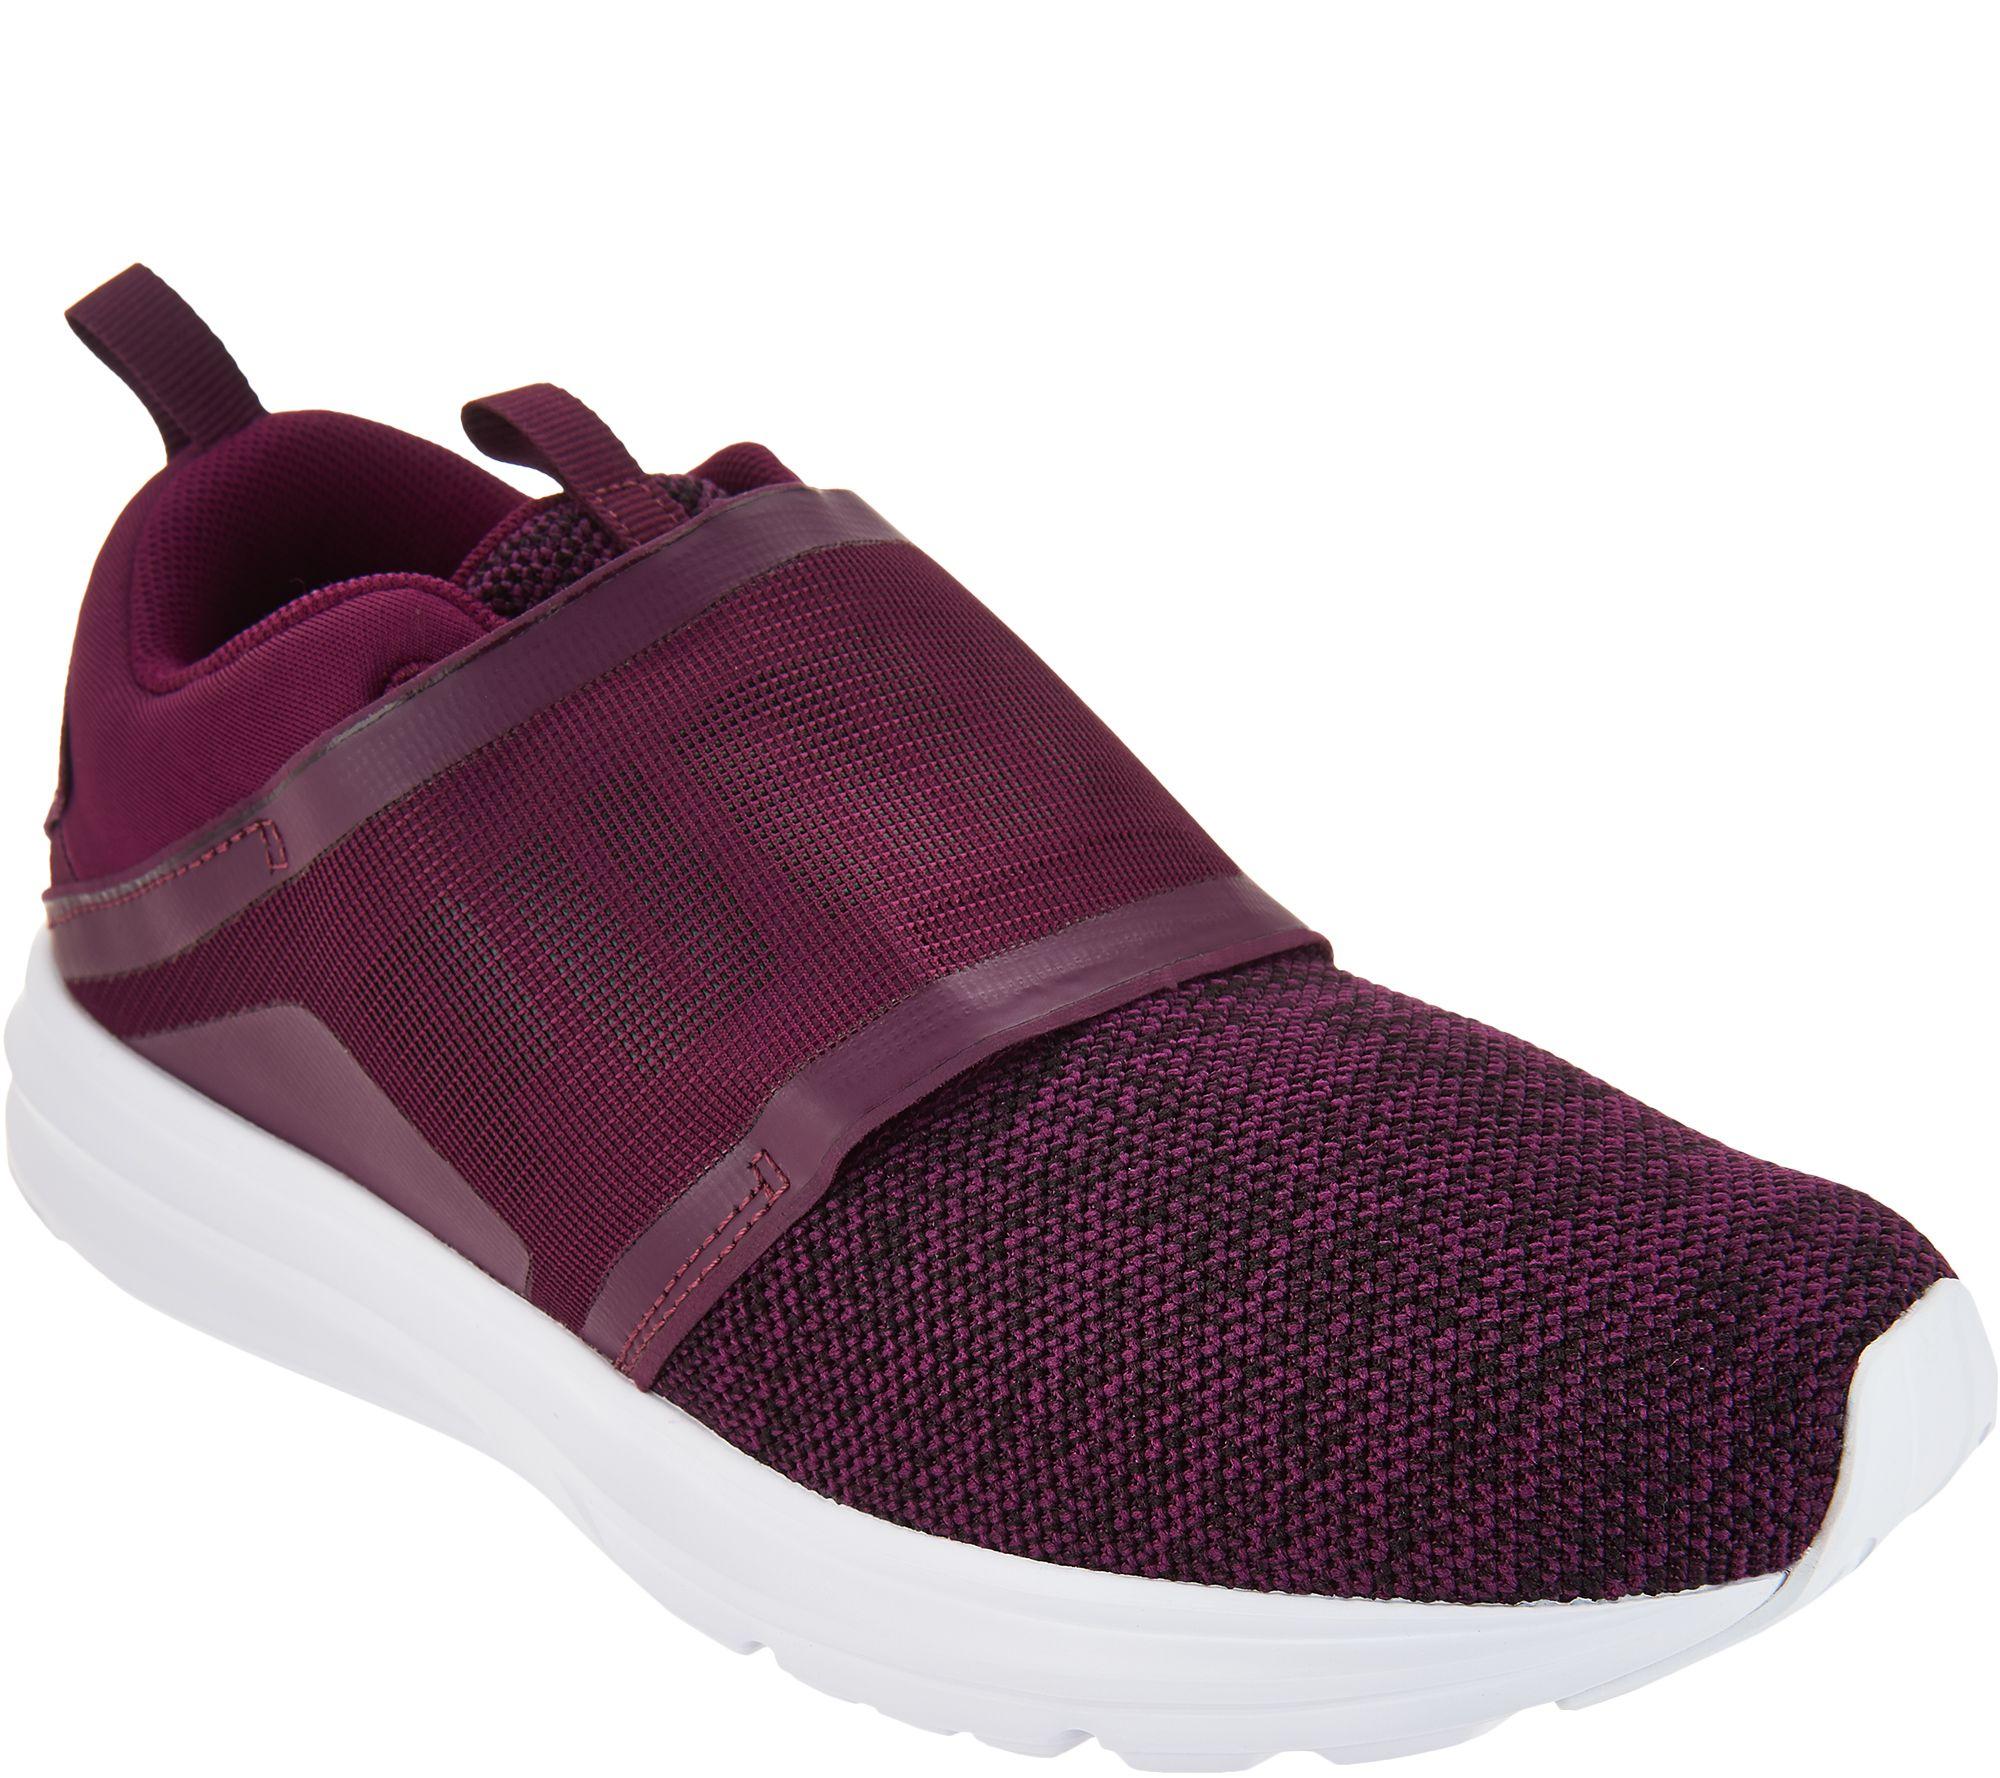 PUMA Knit Lace-up Sneakers - Enzo Strap Knit - Page 1 — QVC.com f3b23675a